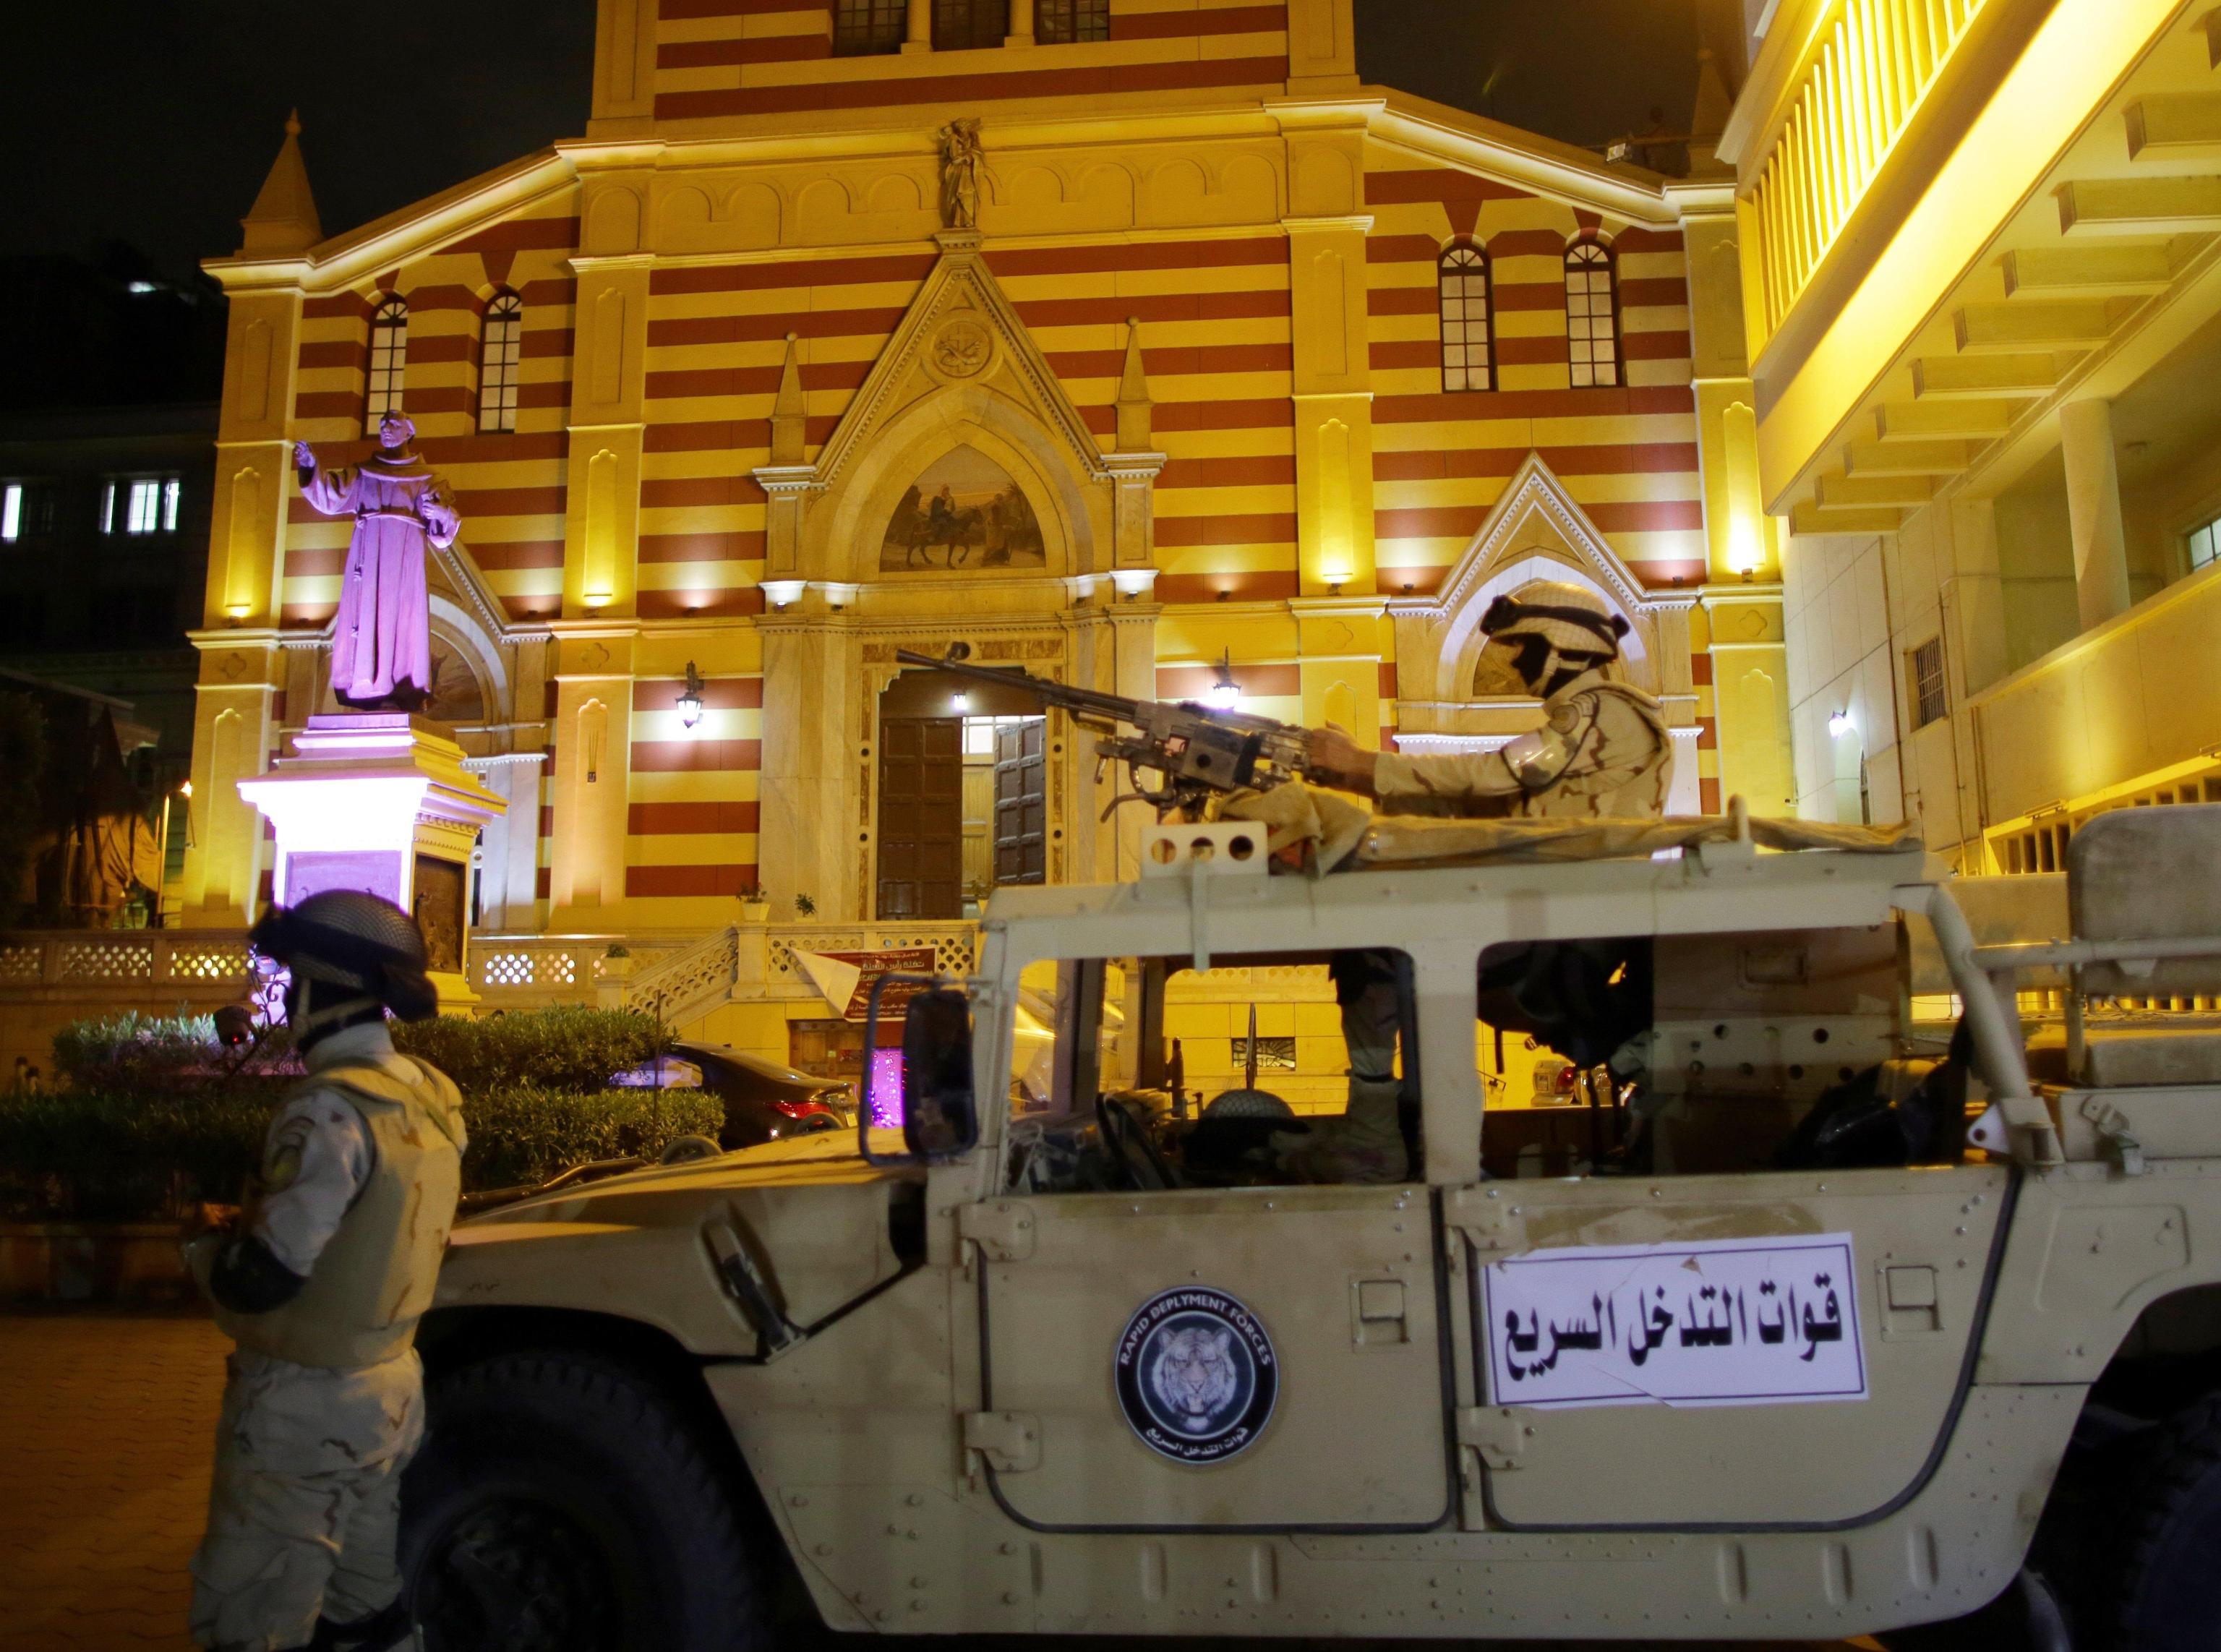 Egitto: militari per proteggere chiese